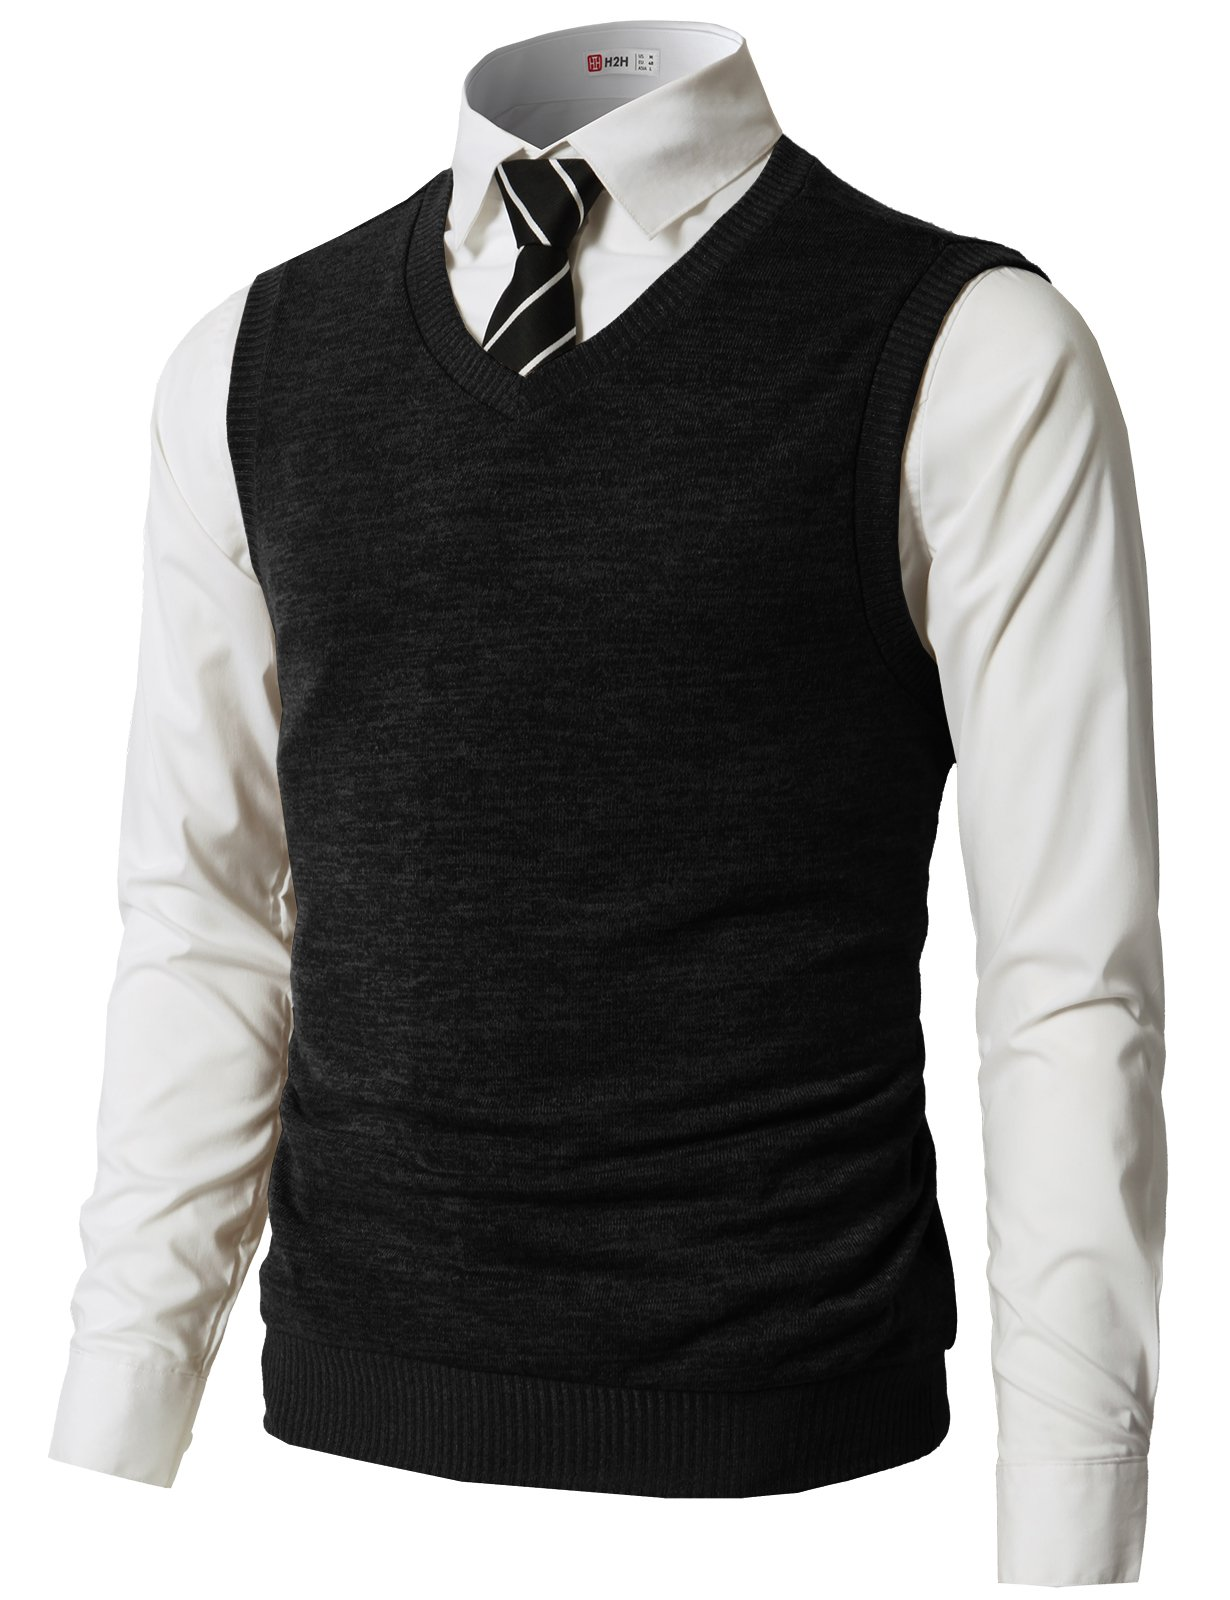 H2H Men's Pima Cotton Solid Button Front Cardigan Vest Of Various Colors Black US 3XL/Asia 4XL (CMOV042) by H2H